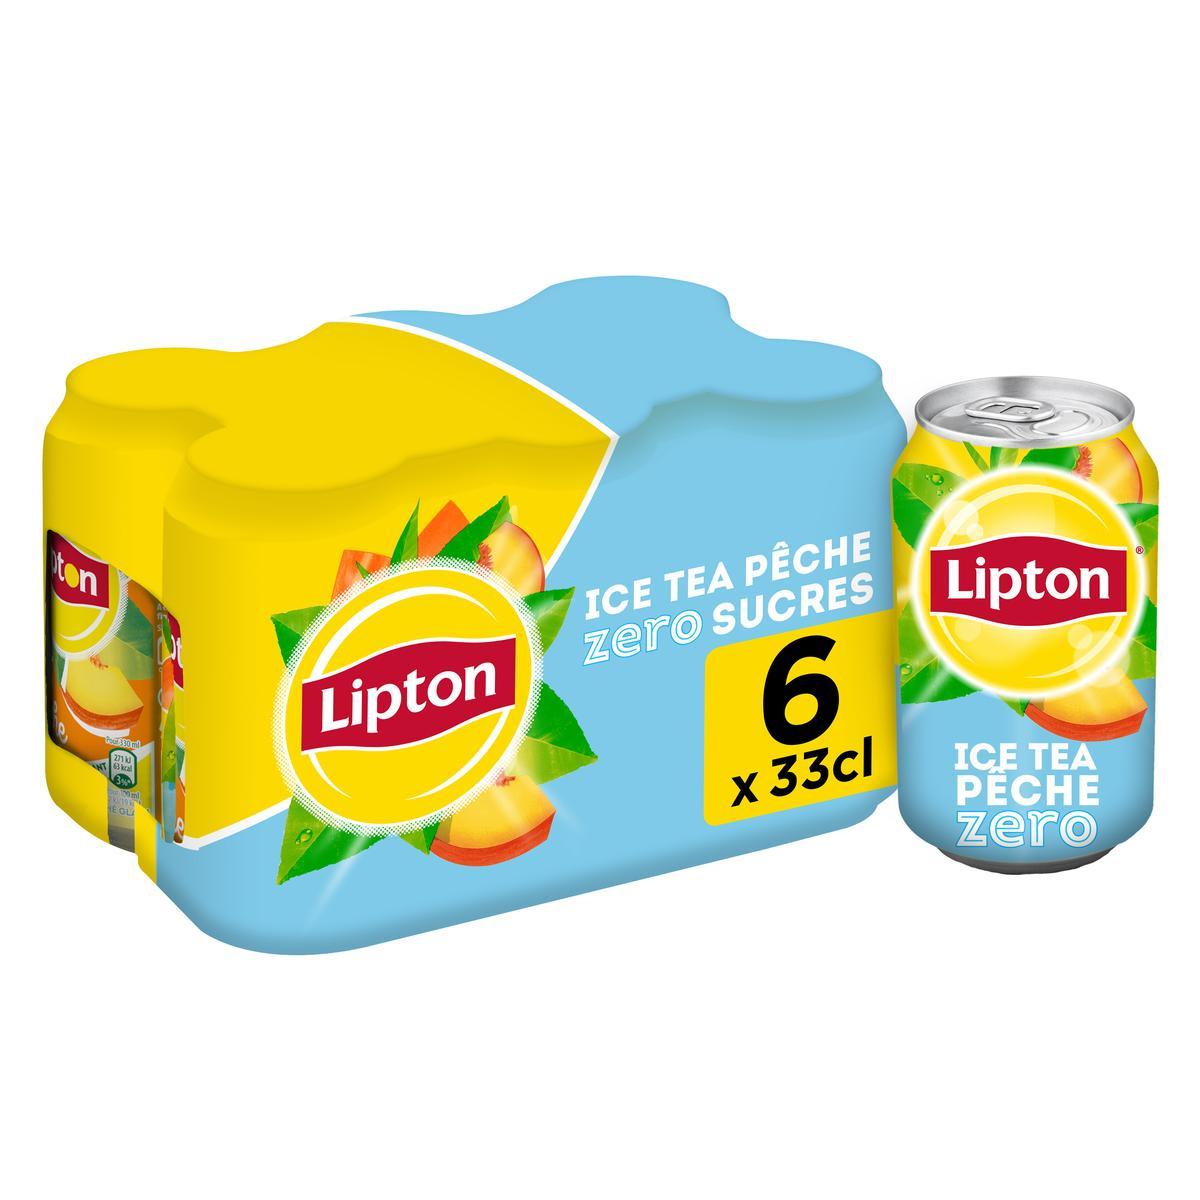 Lipton Ice Tea pêche zéro (6 x 33 cl)